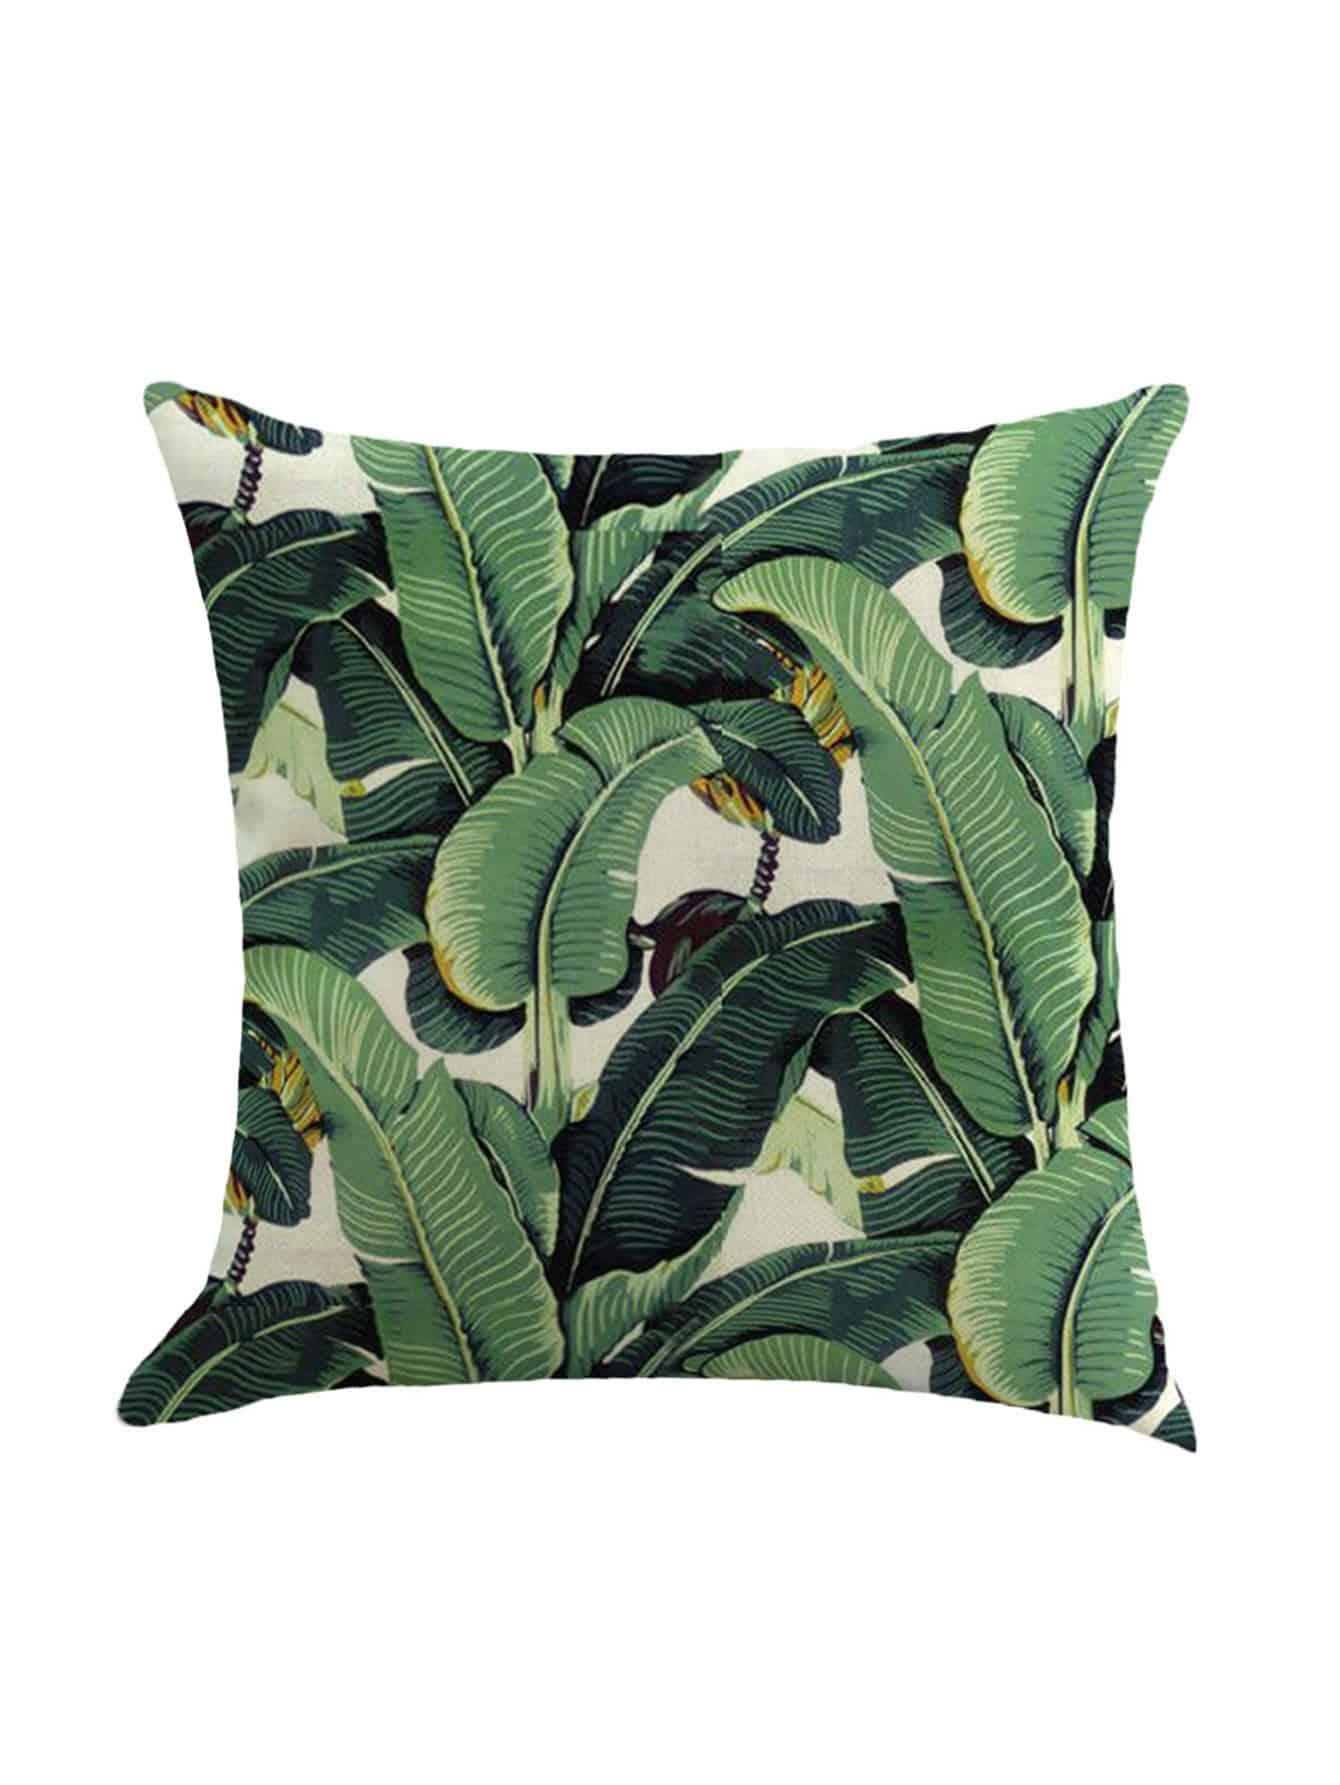 Leaf Print Pillowcase Cover panda print linen pillowcase cover